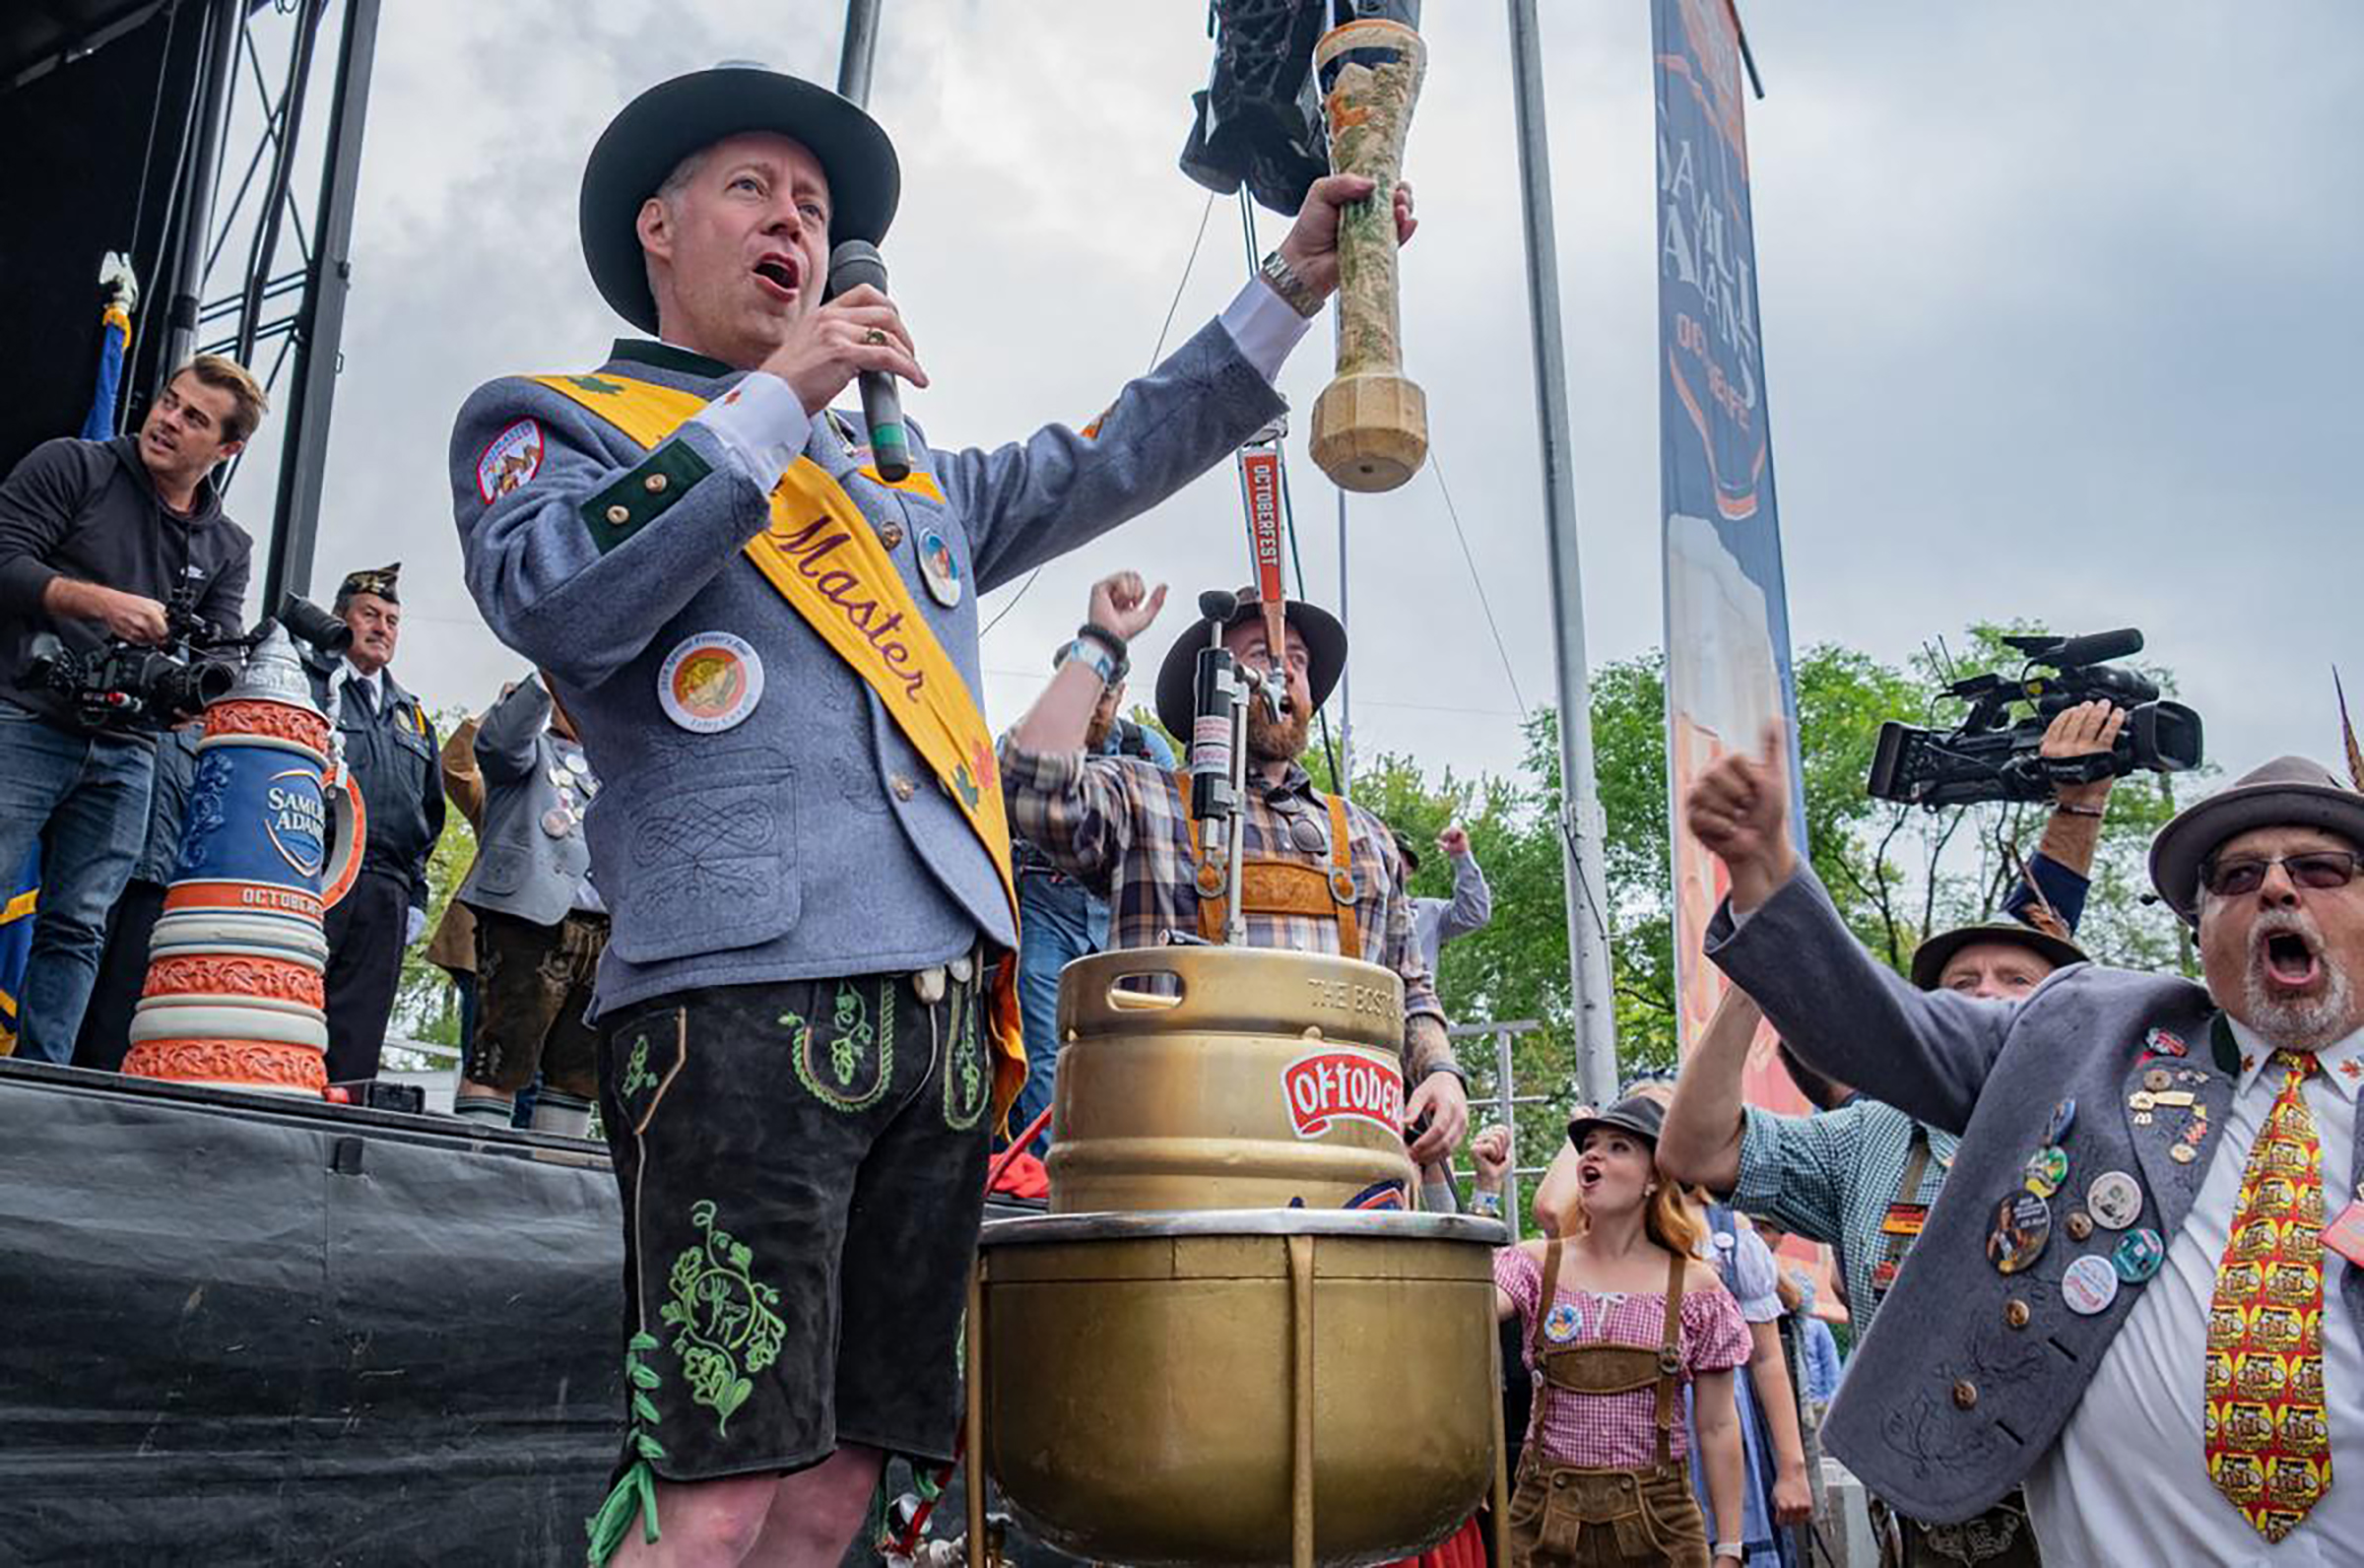 A man performs at La Crosse's annual Oktoberfest in Wisconsin.